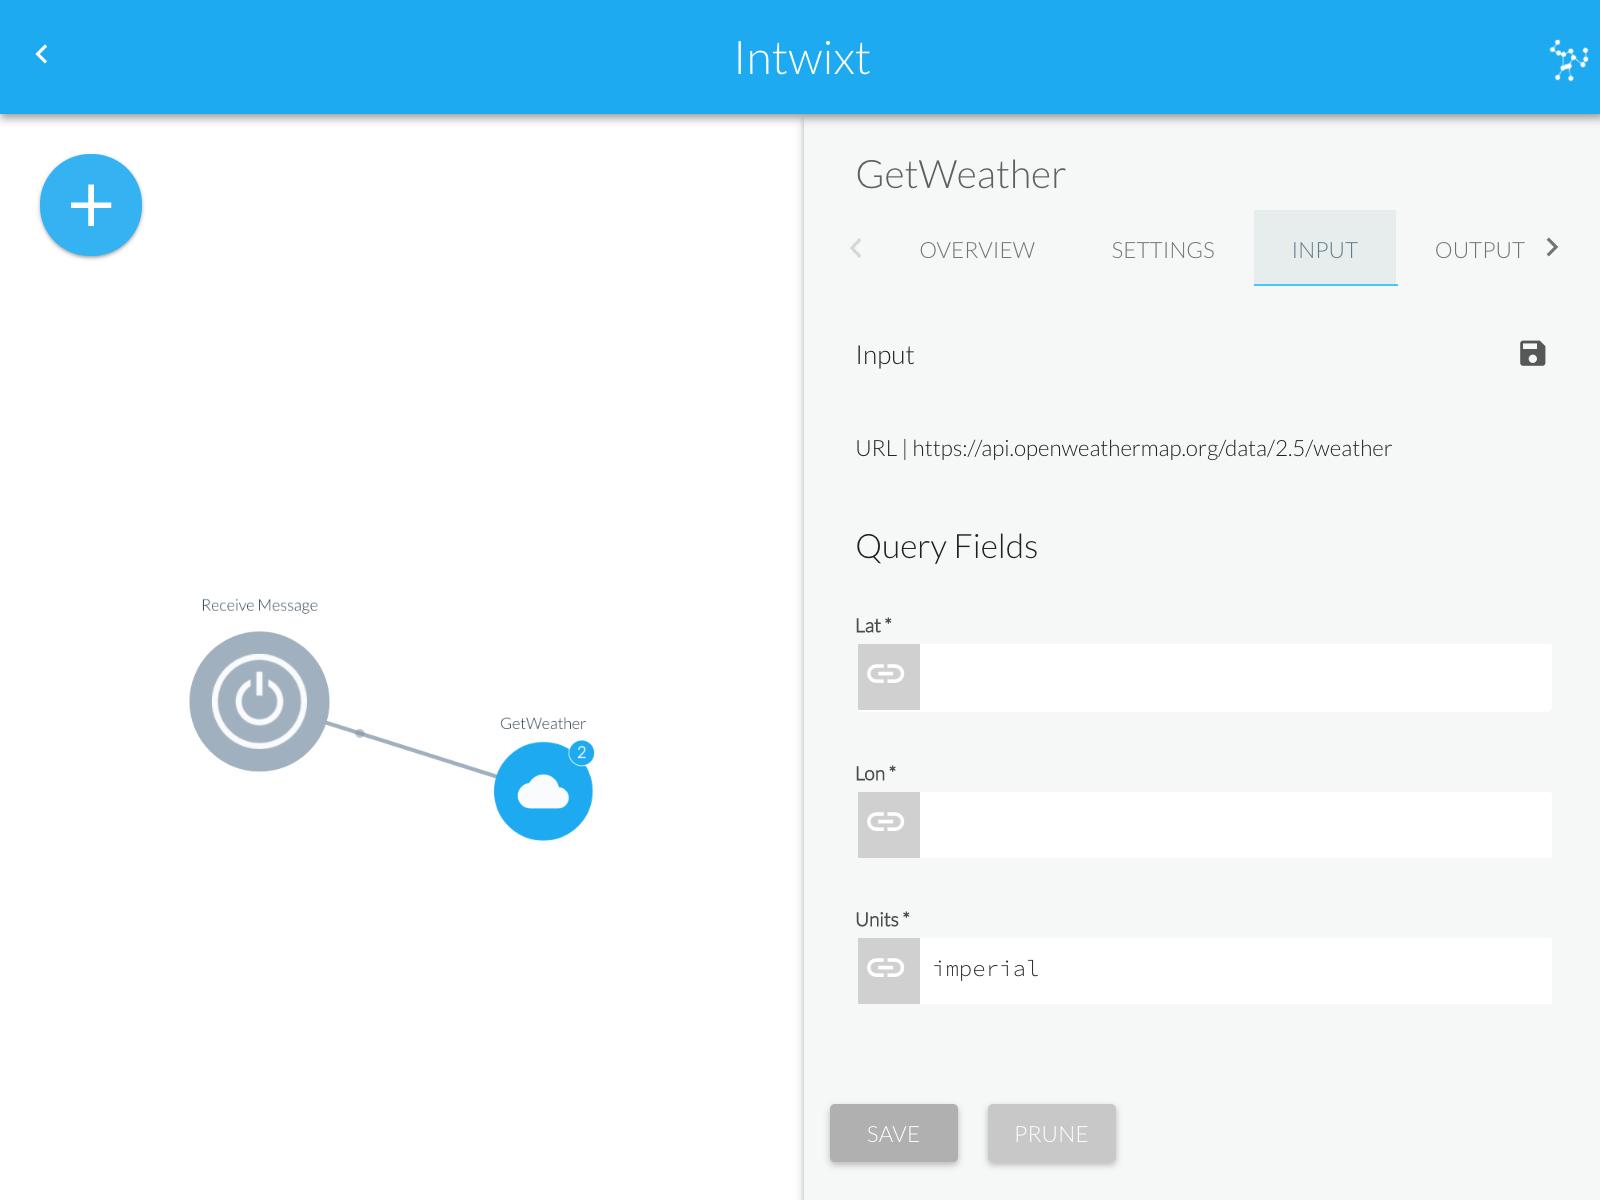 Activity Configuration Panel | INPUT Tab